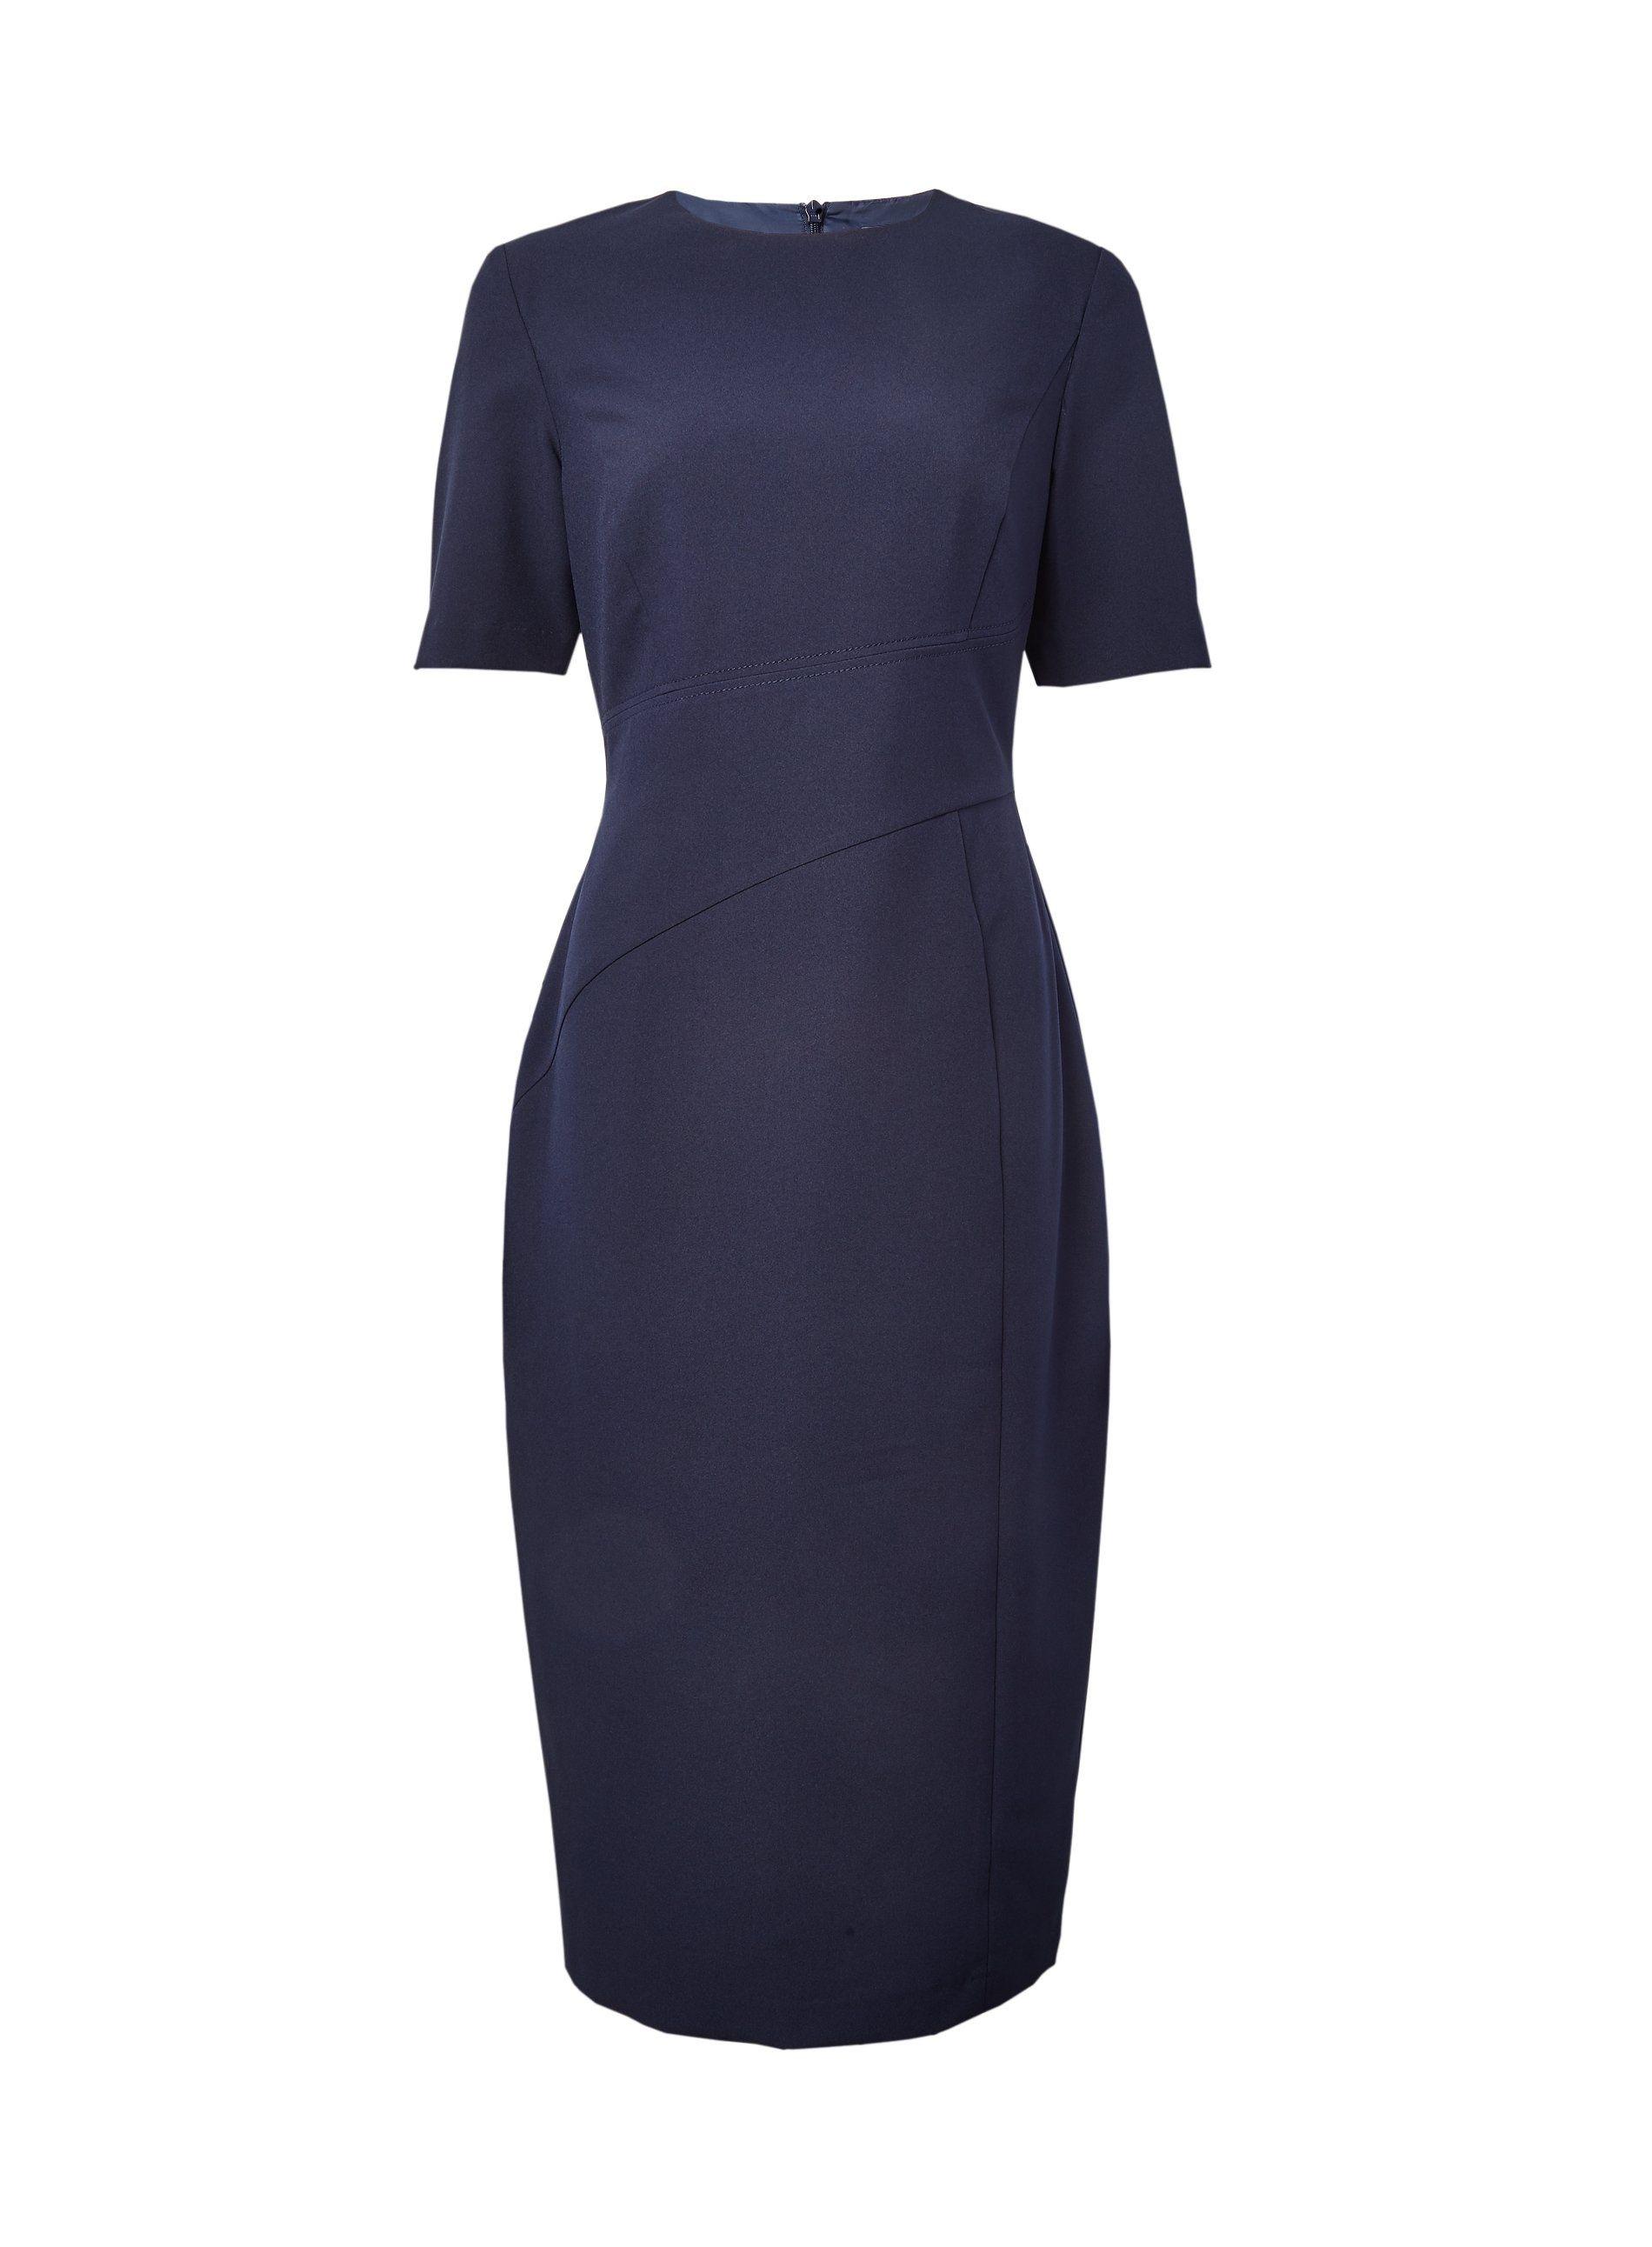 Dorothy Perkins Womens Tall Navy Centre Seam Pencil Midi Dress Round Neck